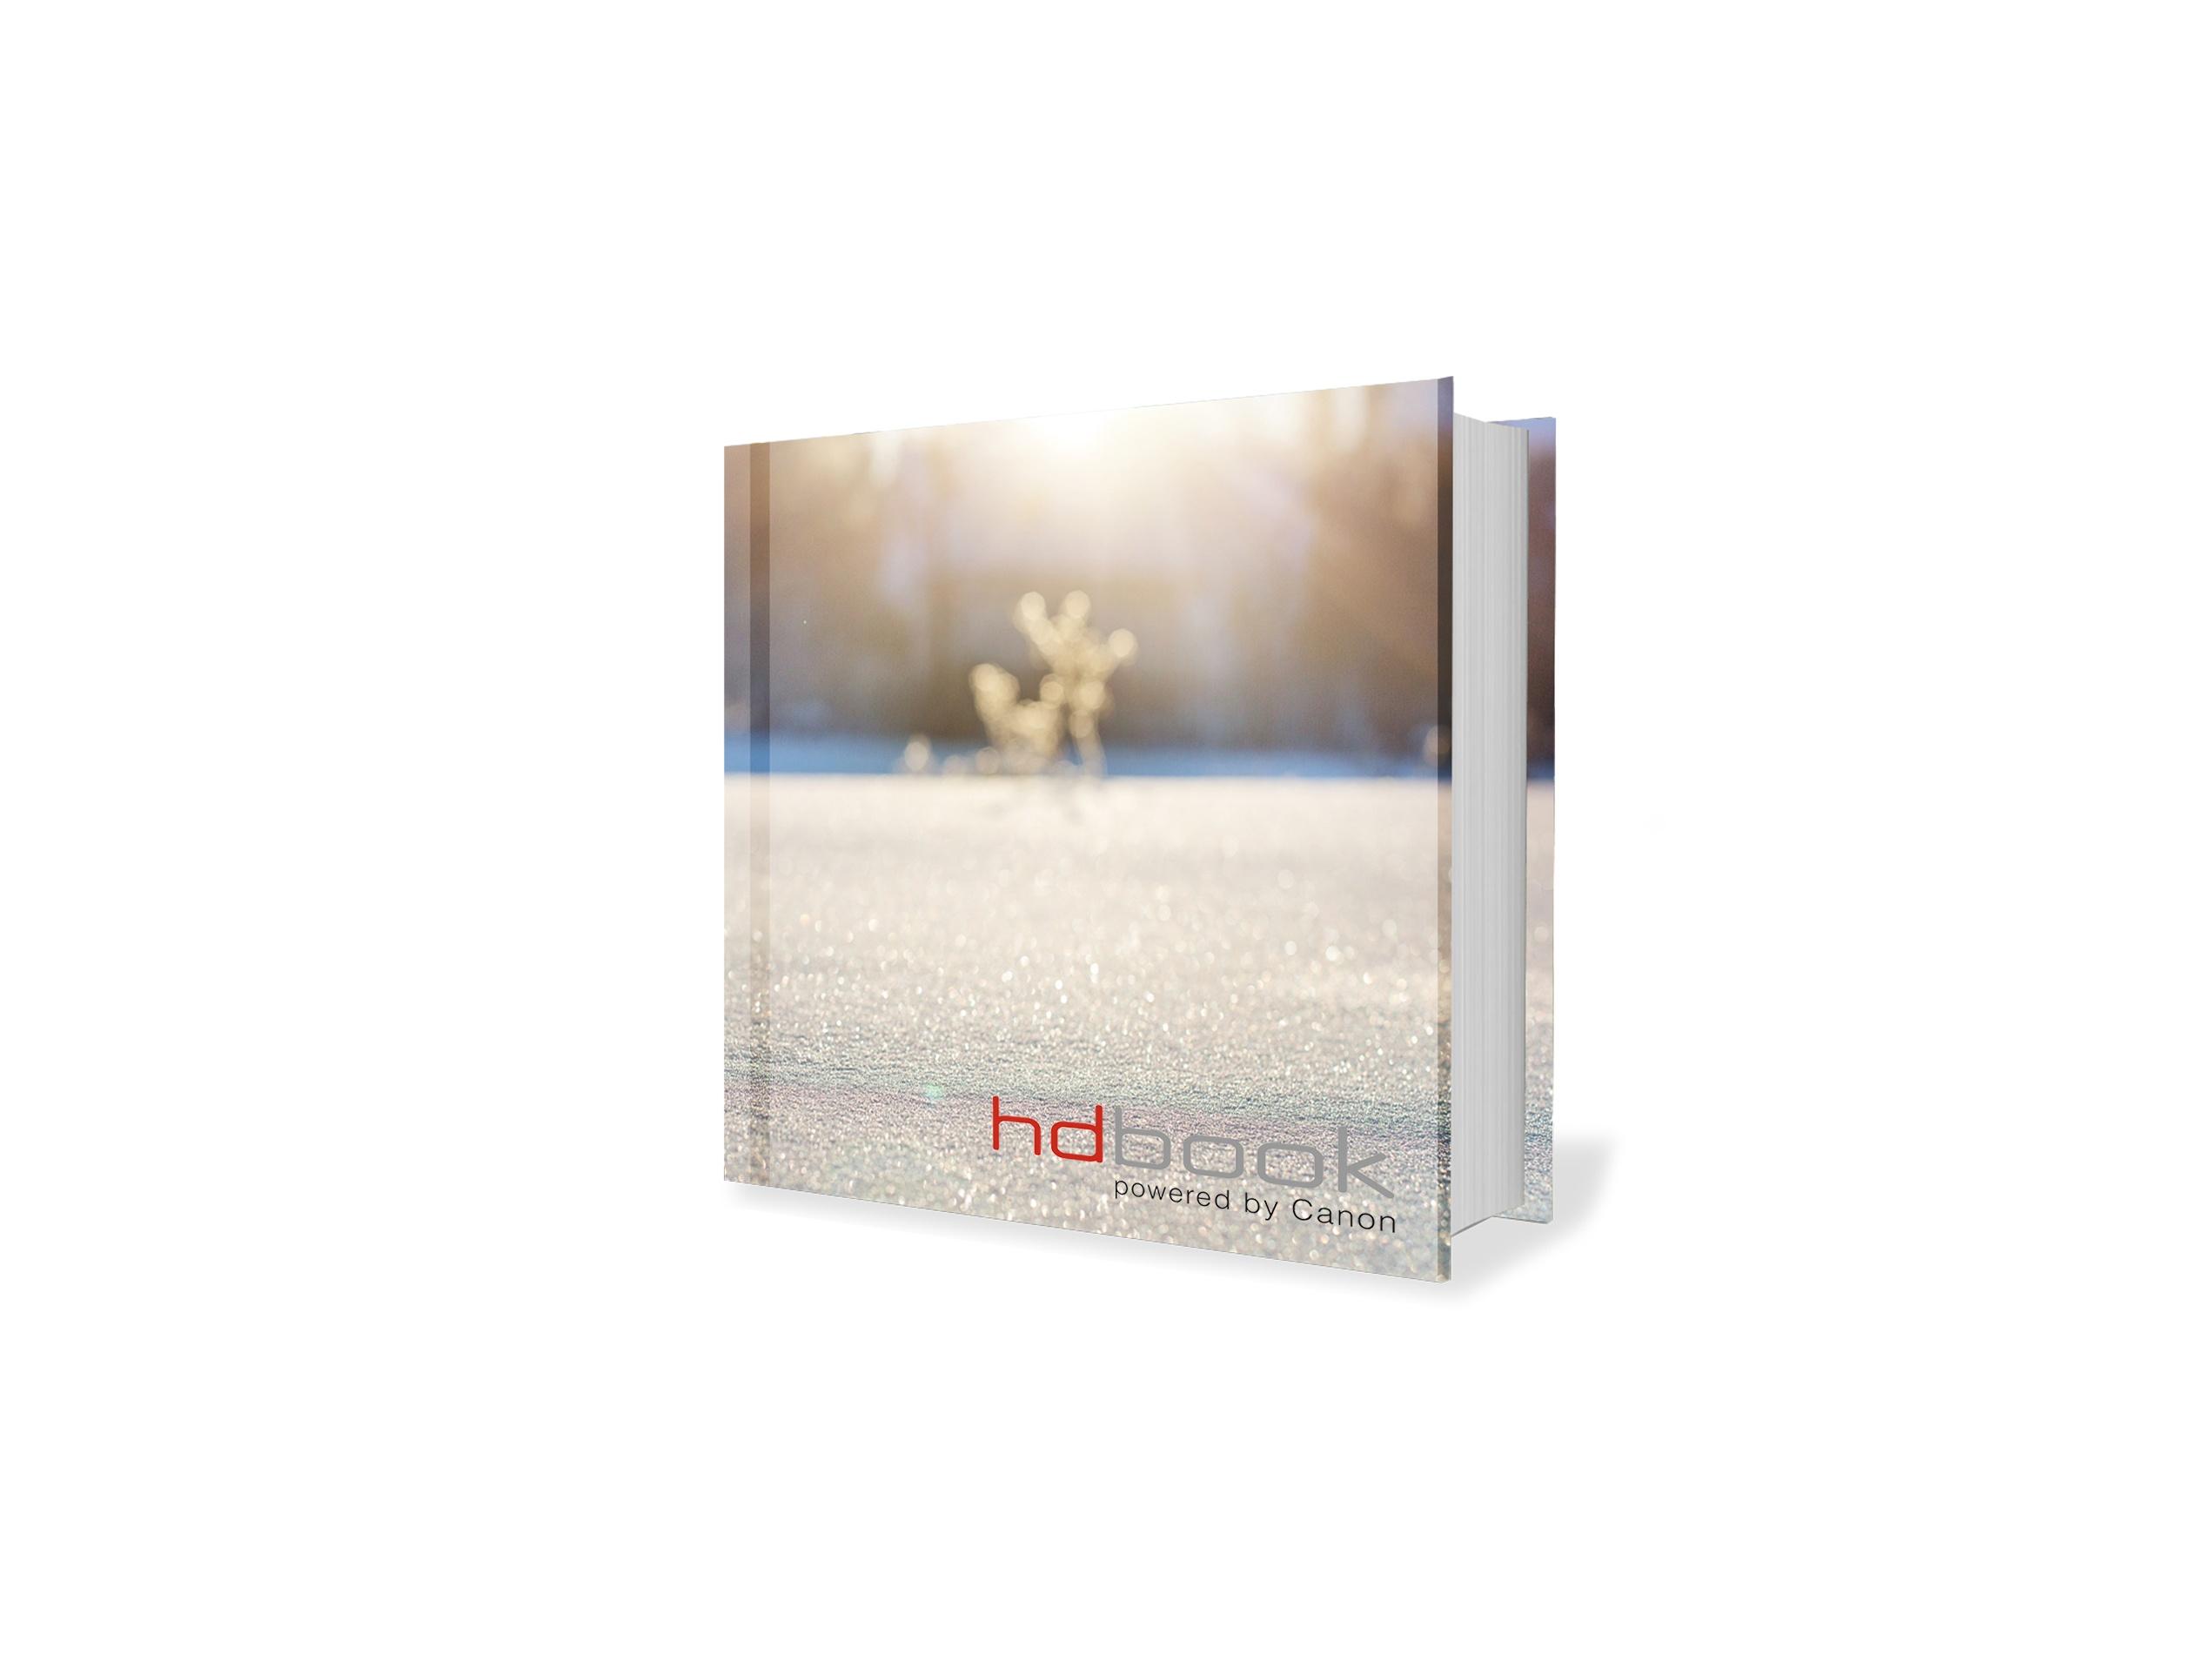 hdbook_fotoalbum_canon_natura